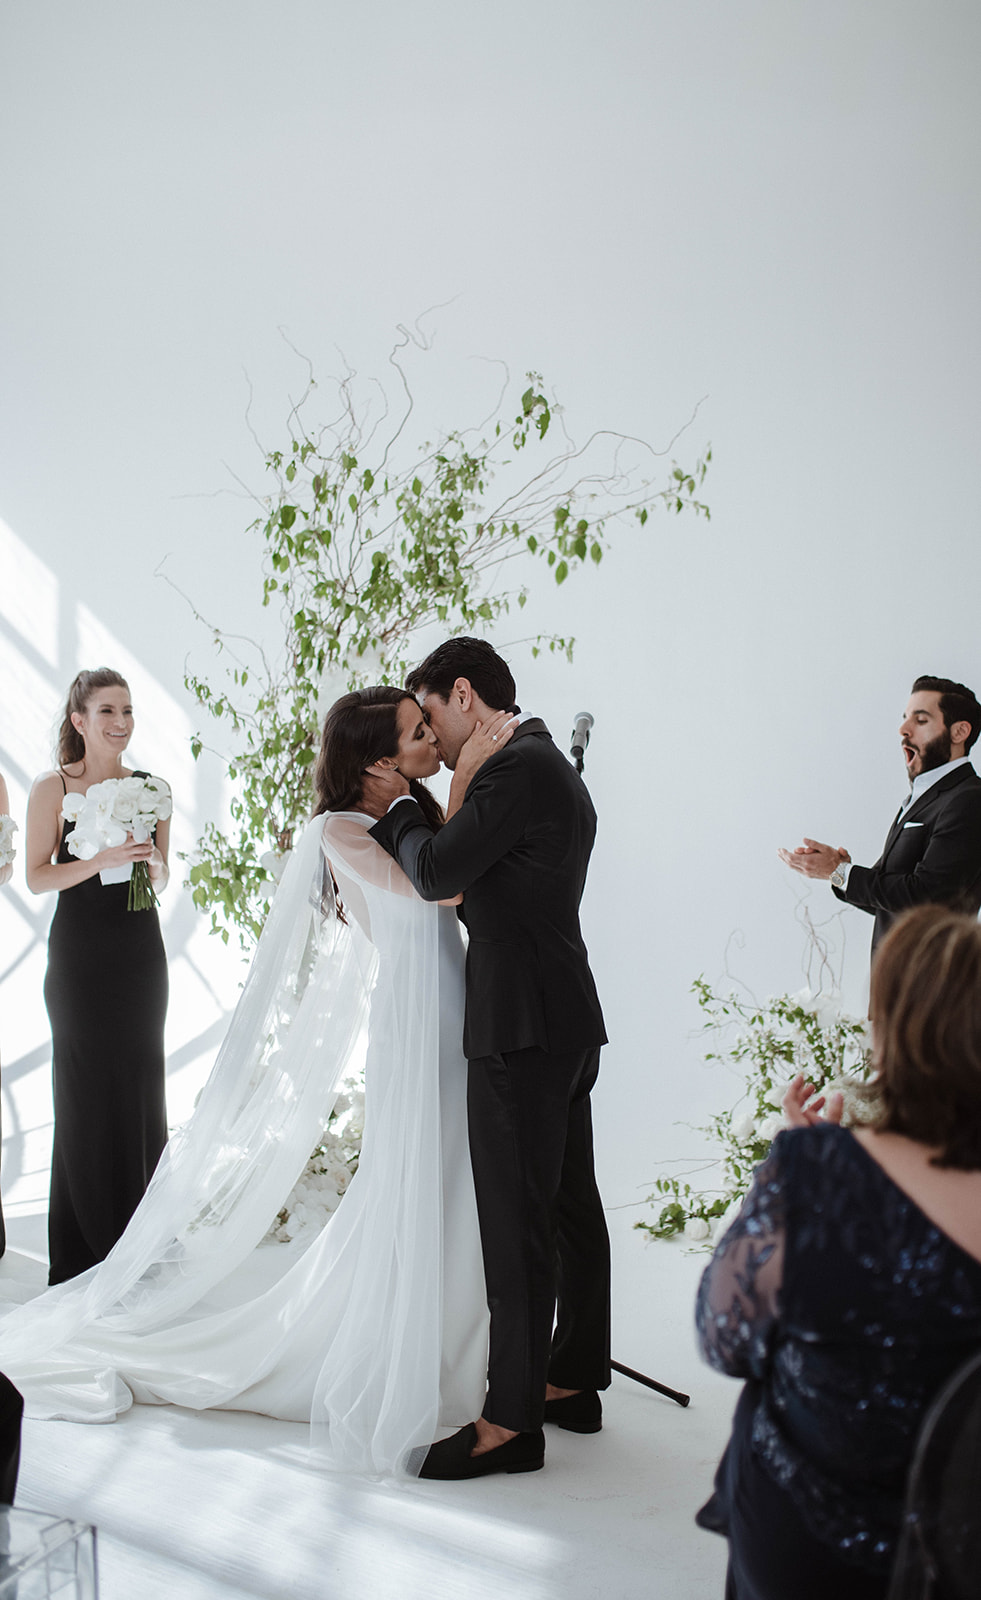 Jenna___Austin_Wedding_Day-_LHP-605.jpg